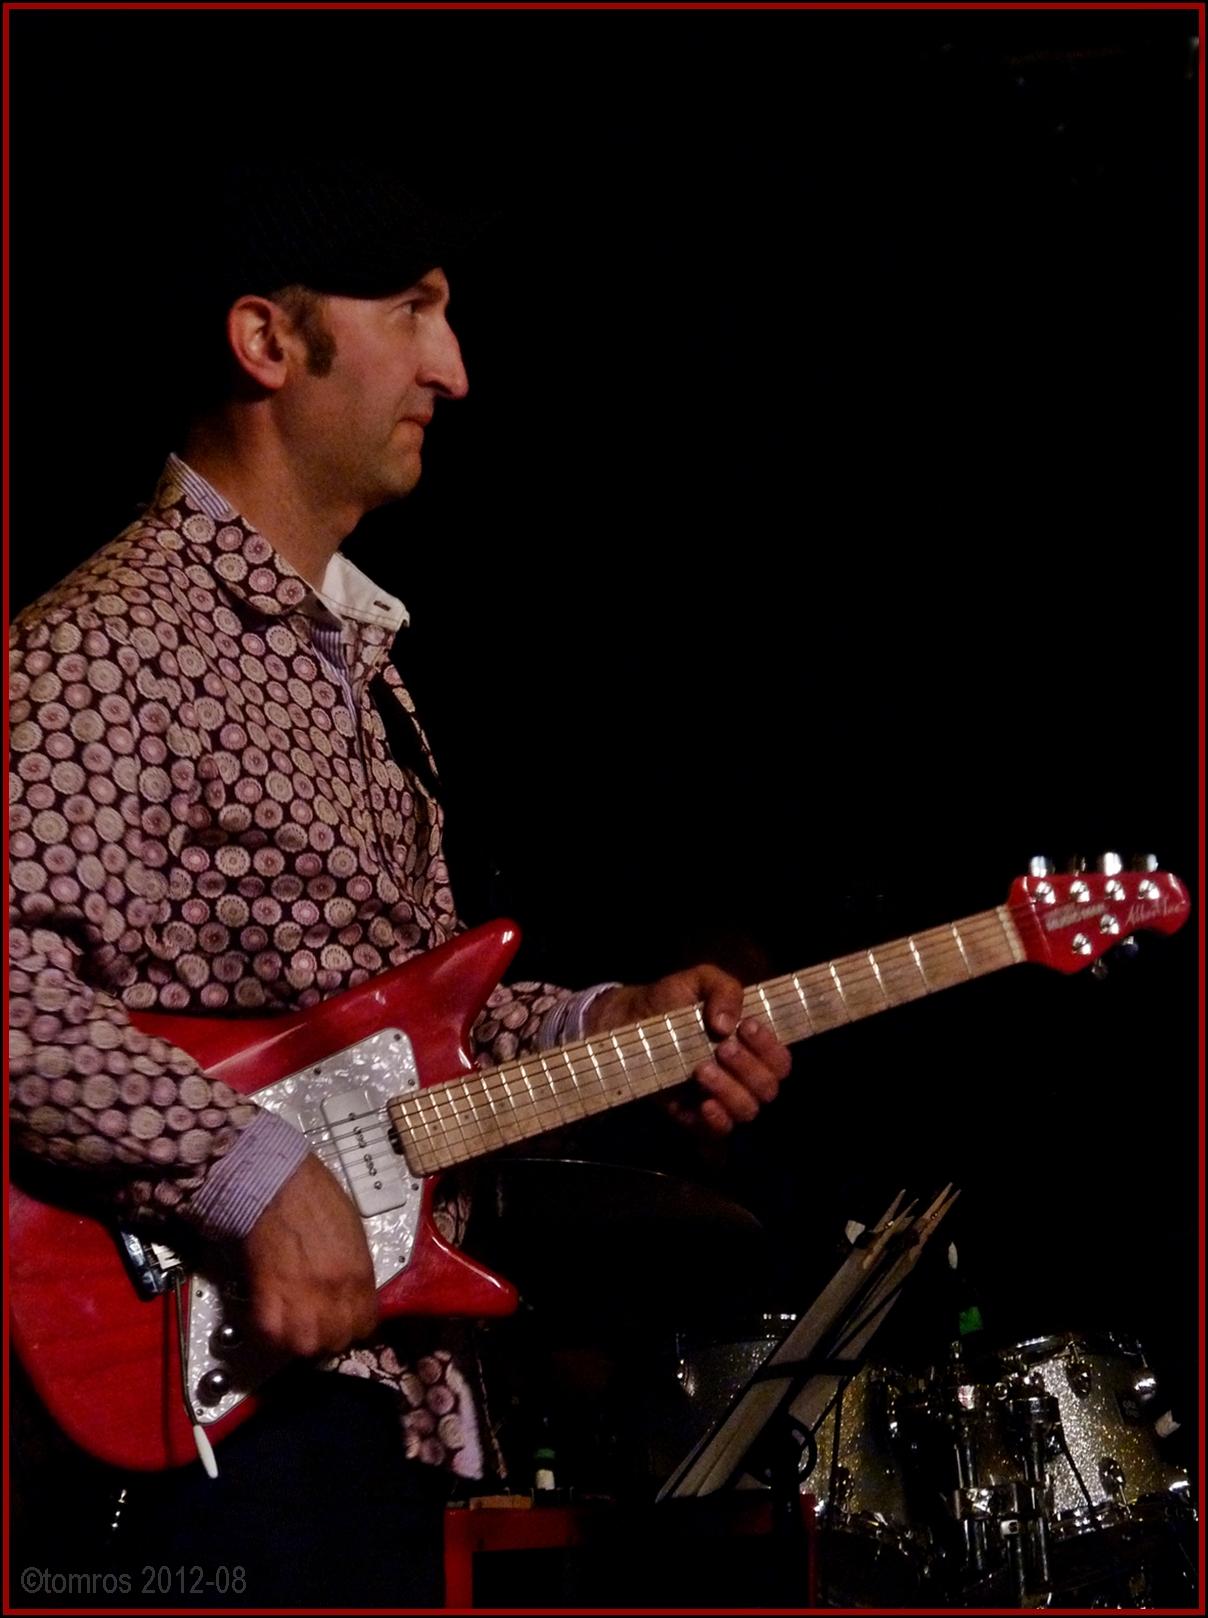 Michael Occhipinti, Sideman to Don Byron at Markham Jazz Festival, August 18, 2012